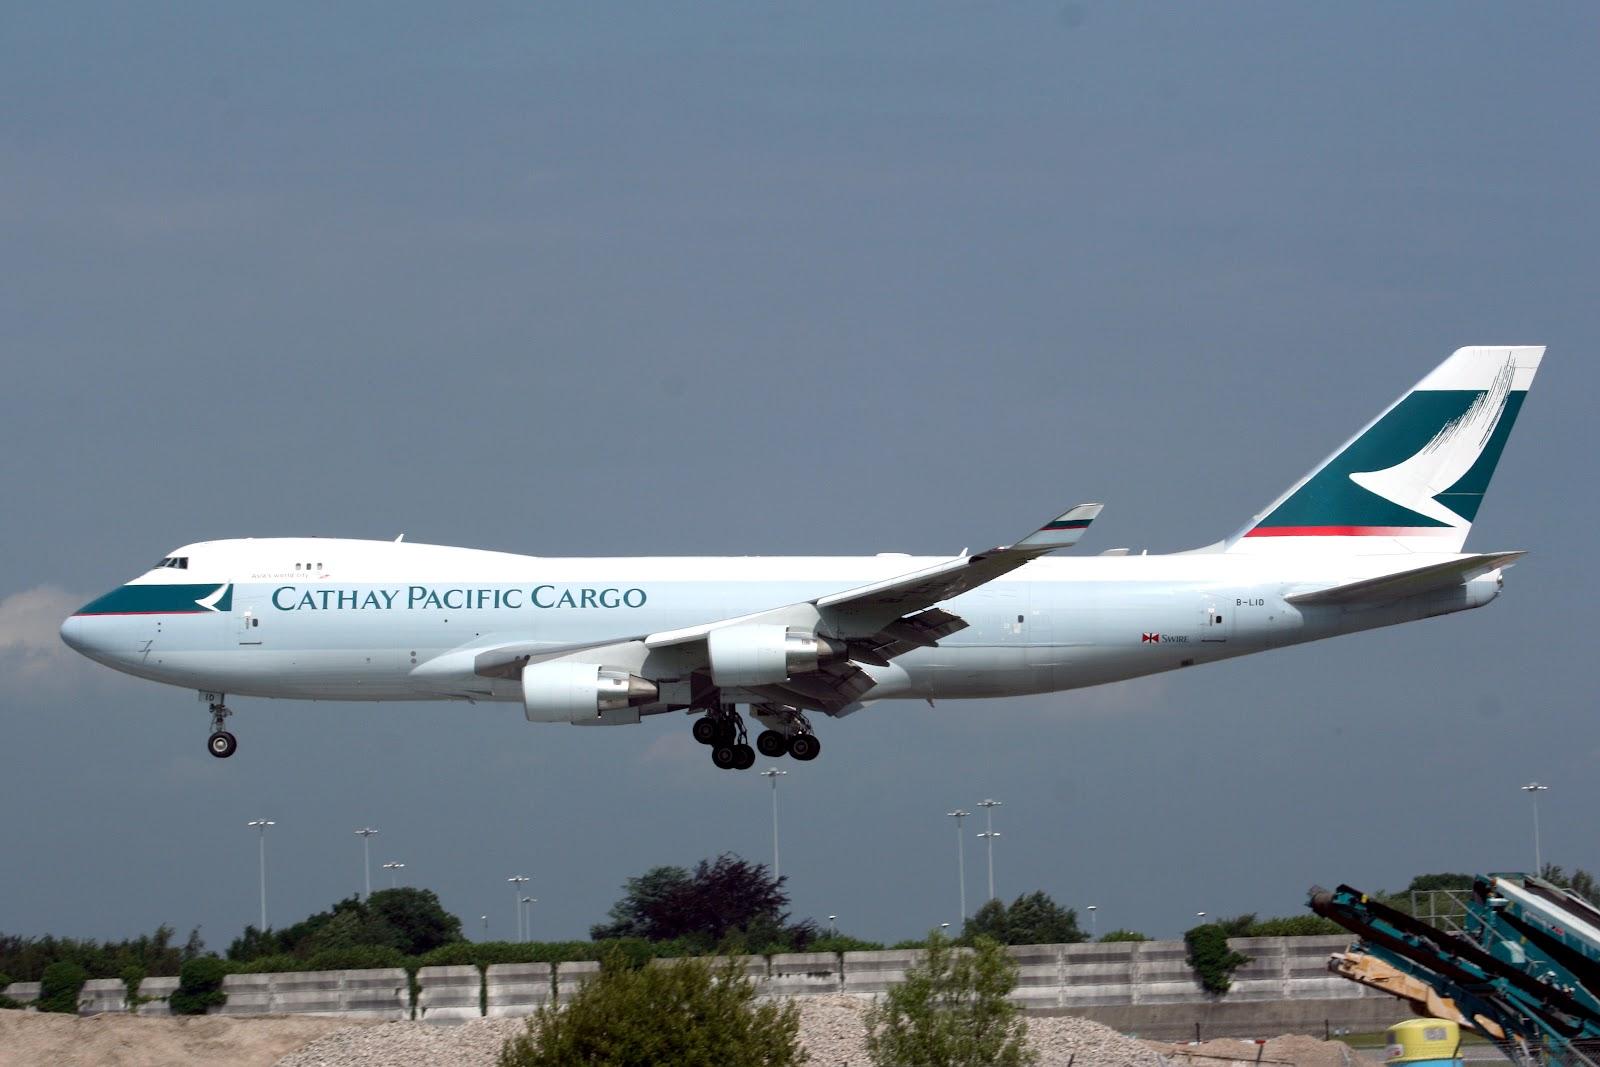 http://3.bp.blogspot.com/-IPNu3VYiTq0/UAt5ZQ6PjJI/AAAAAAAAKto/xnE1VKcMUL0/s1600/boeing_747-400f_cathay_pacific_cargo.jpg